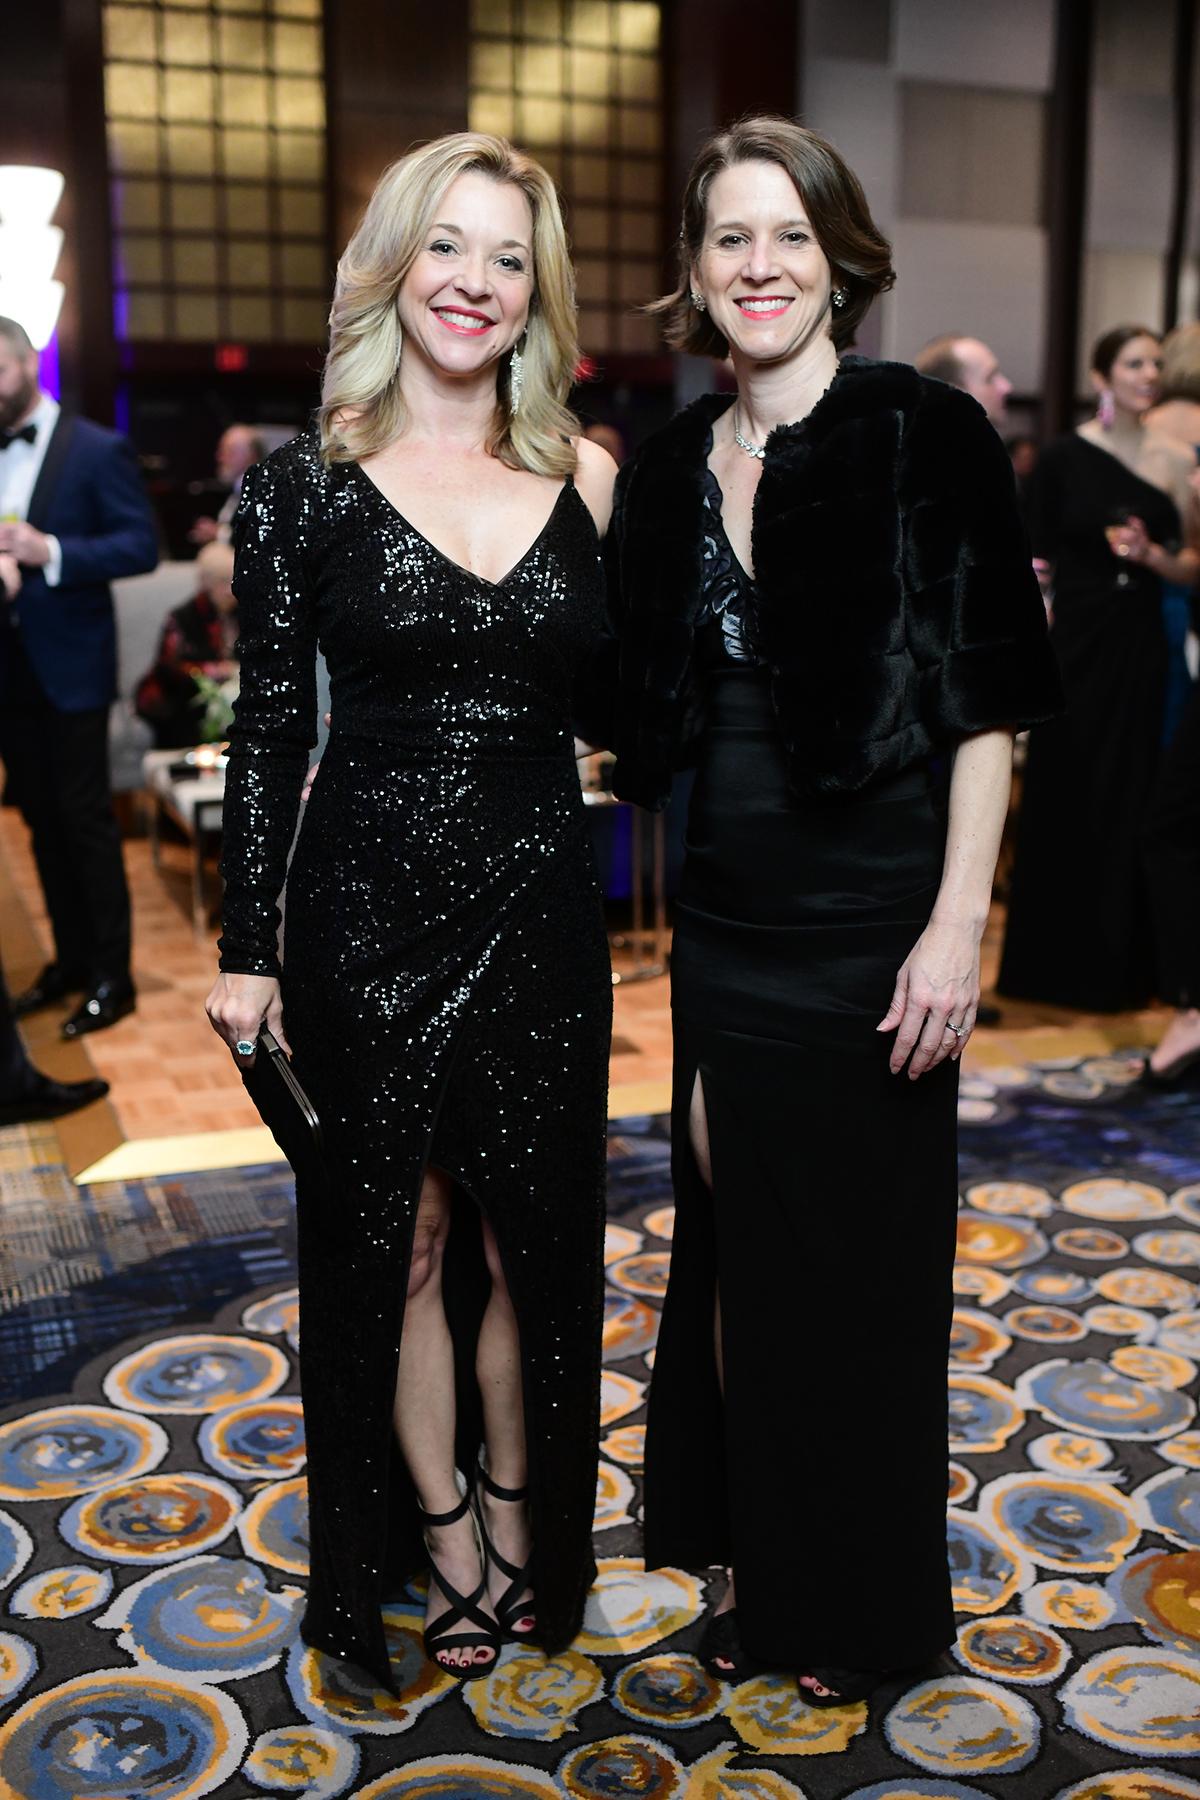 Shari Silverman and Julie Baker Fink